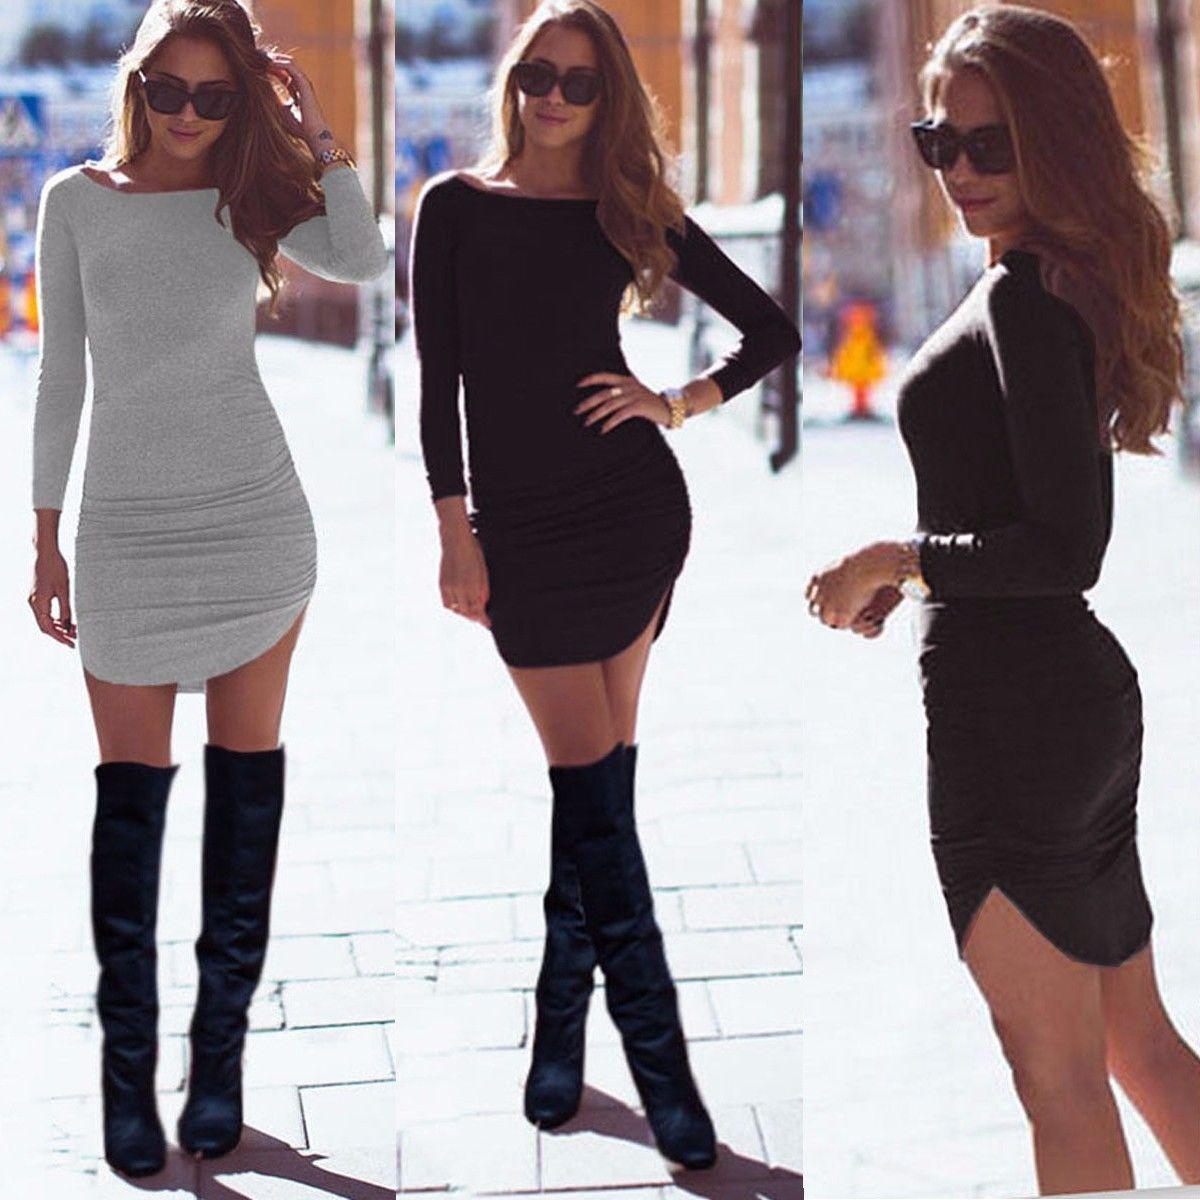 474d6c206d696 US $6.3 9% OFF|Plus Size Women Clothing 2016 Autumn Long Sleeve Mini  Bodycon Tunic Slim Party Sexy Clubwear Side Split Tshirt Bandage Dresses-in  ...